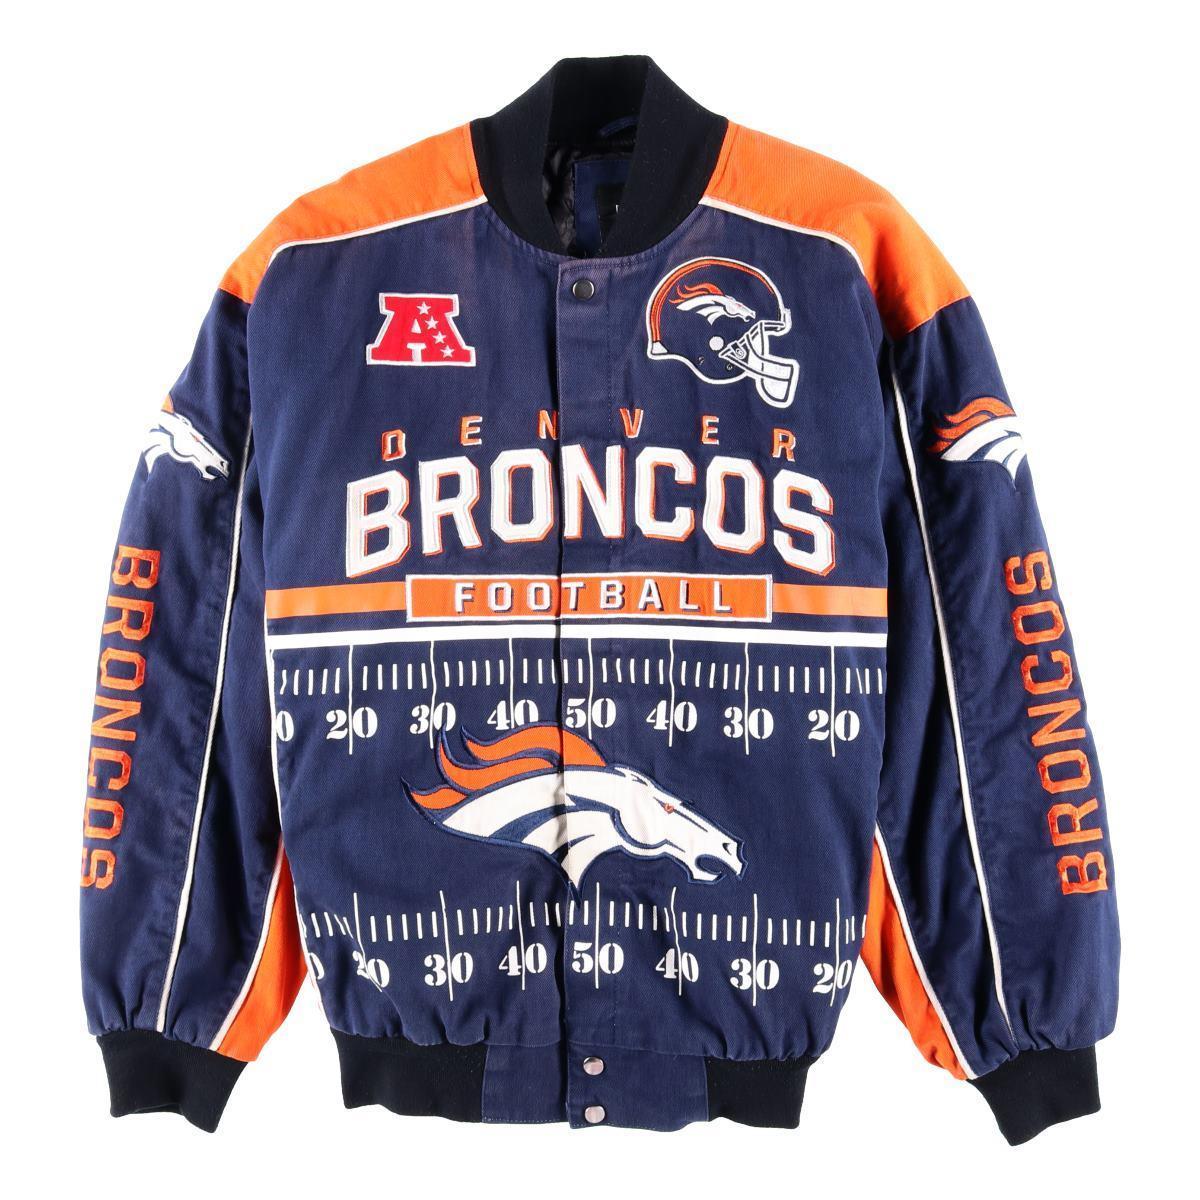 NFL DENVER BRONCOS デンバーブロンコス レーシングジャケット メンズXXL /wbf2400 【中古】 【190708】【PD2001】【CS2003】【SS2003】